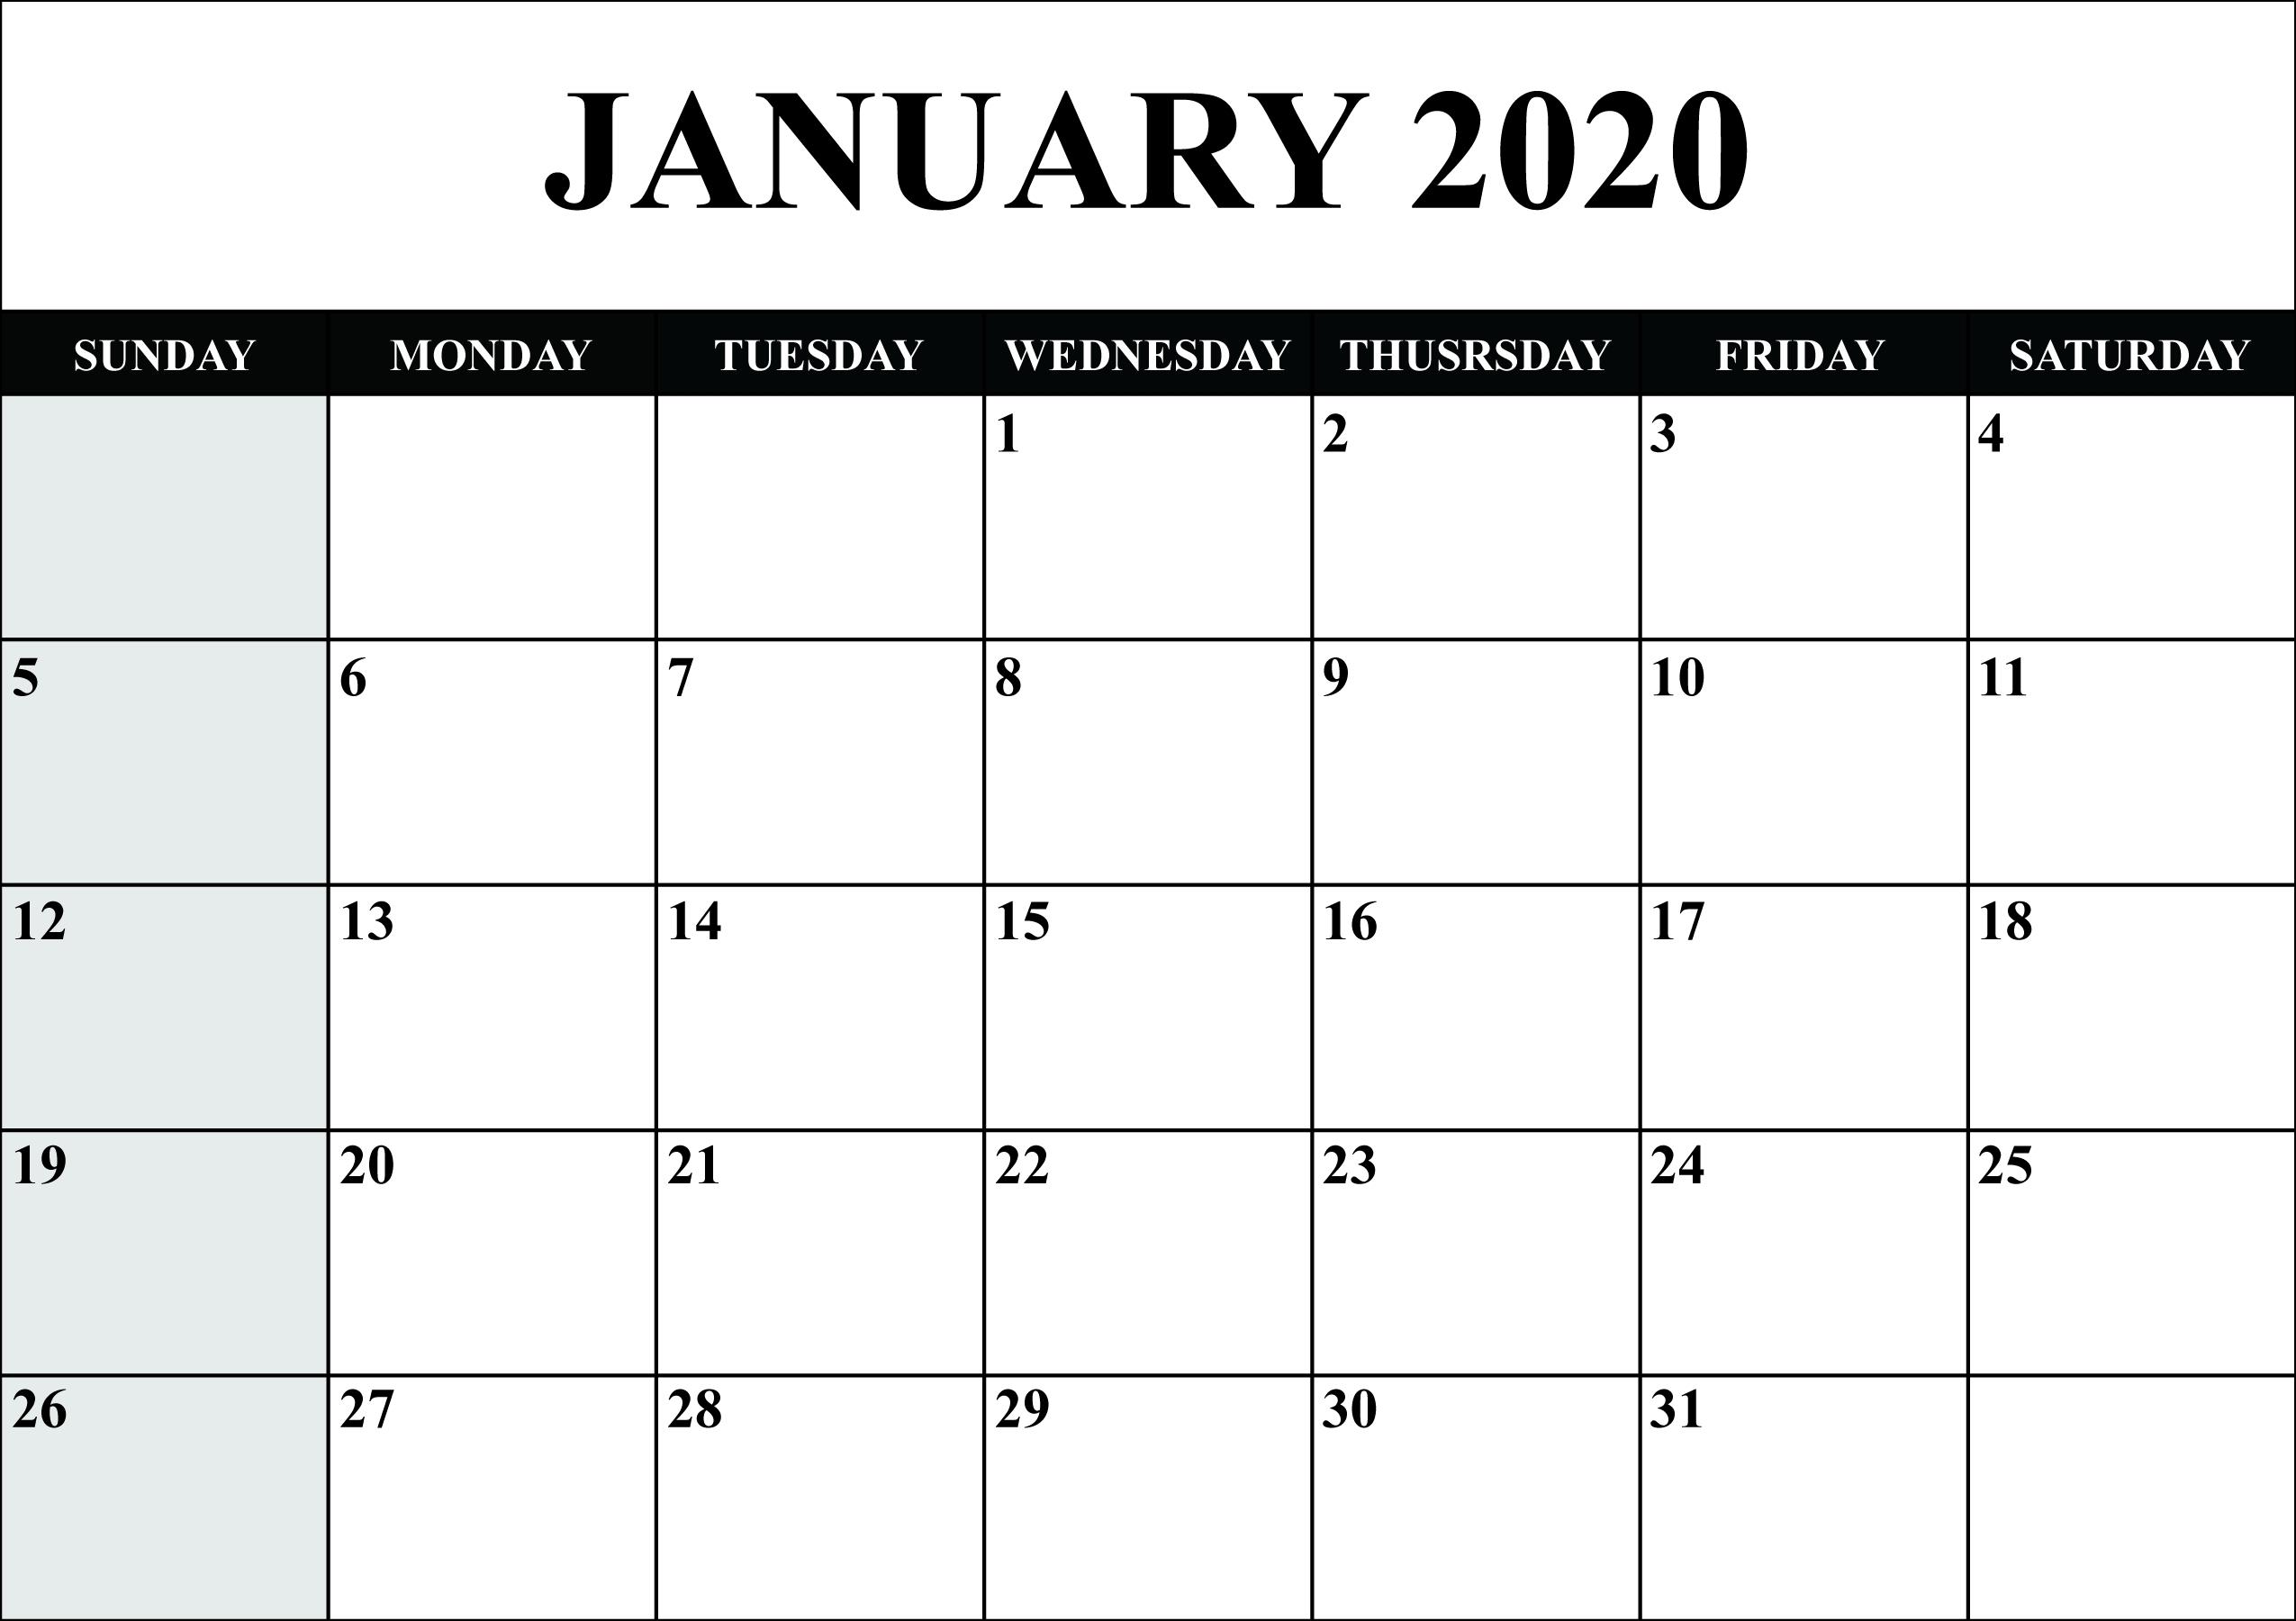 Free Blank January 2020 Calendar Printable In Pdf, Word Perky 2020 Monthly Calendar Template Word